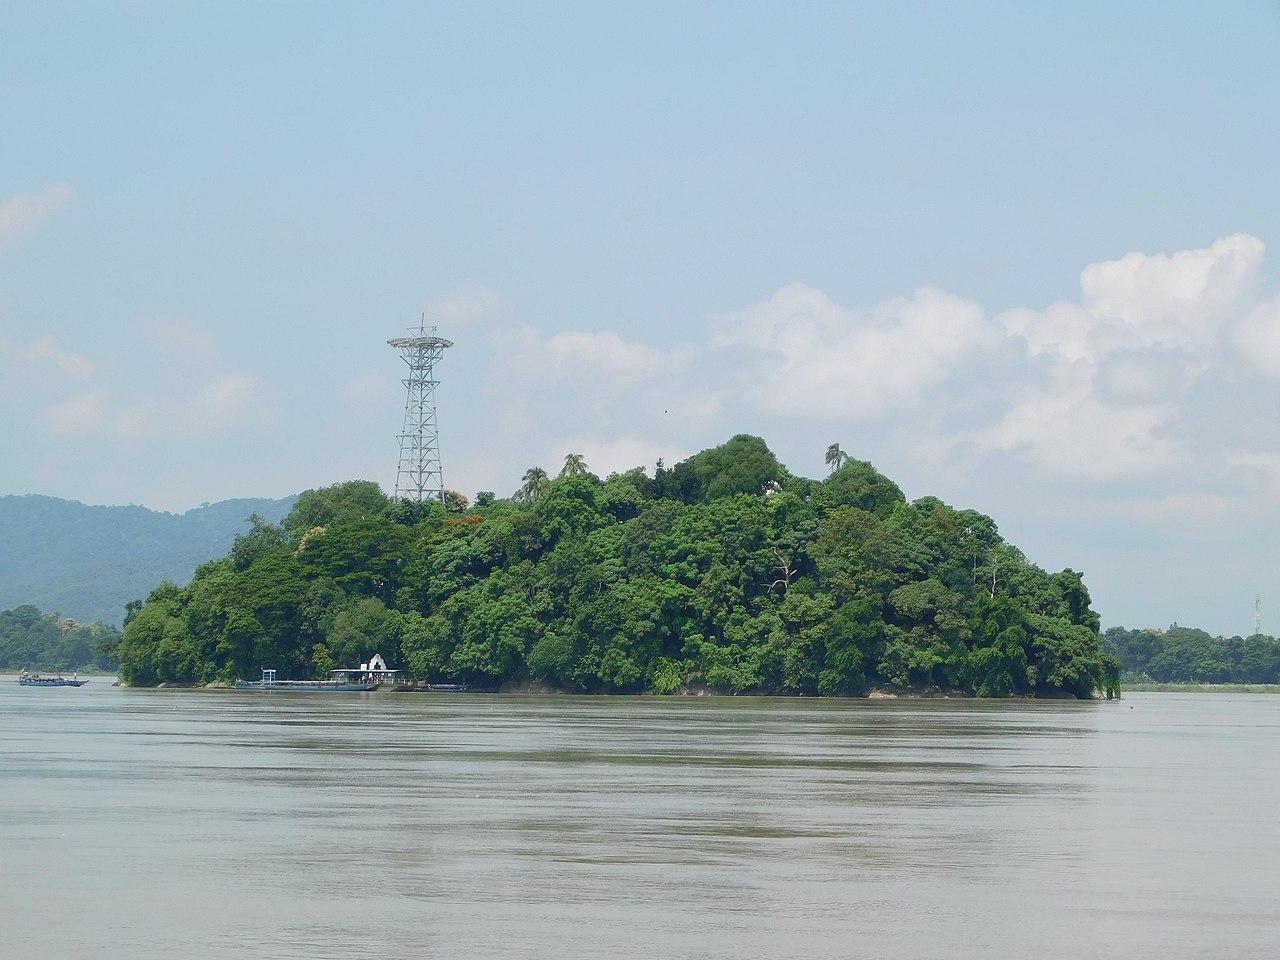 History of the Umananda Island